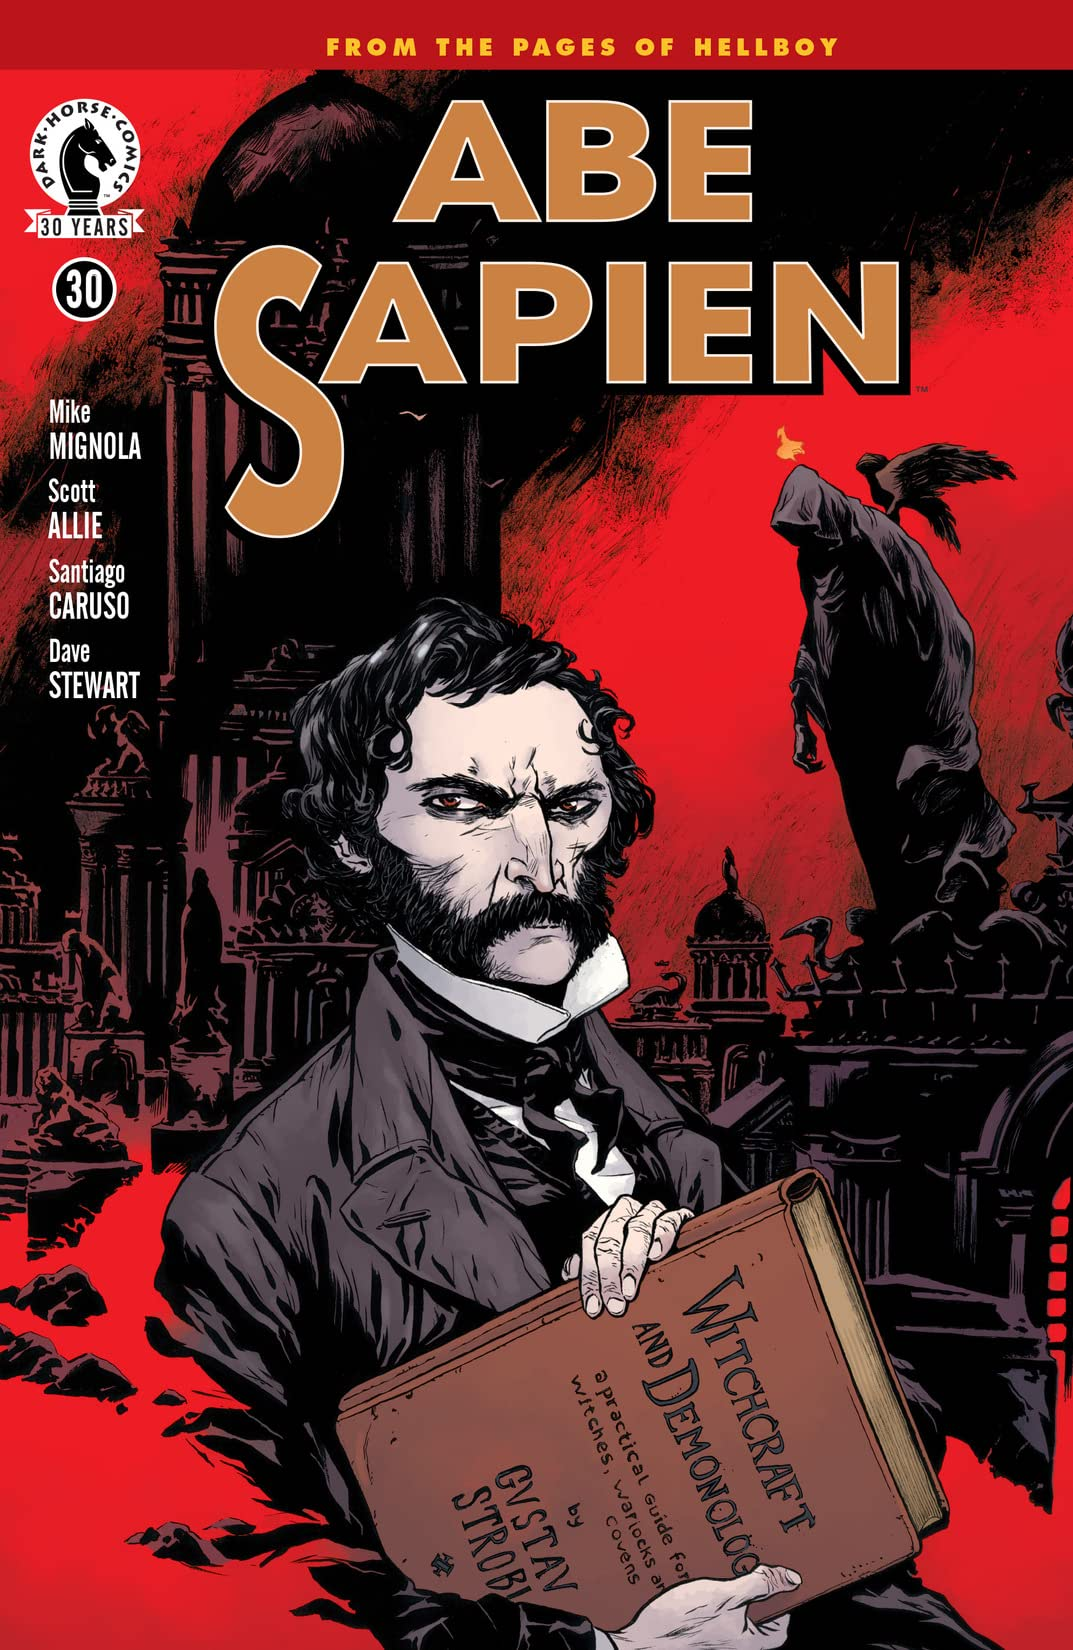 Abe Sapien #30